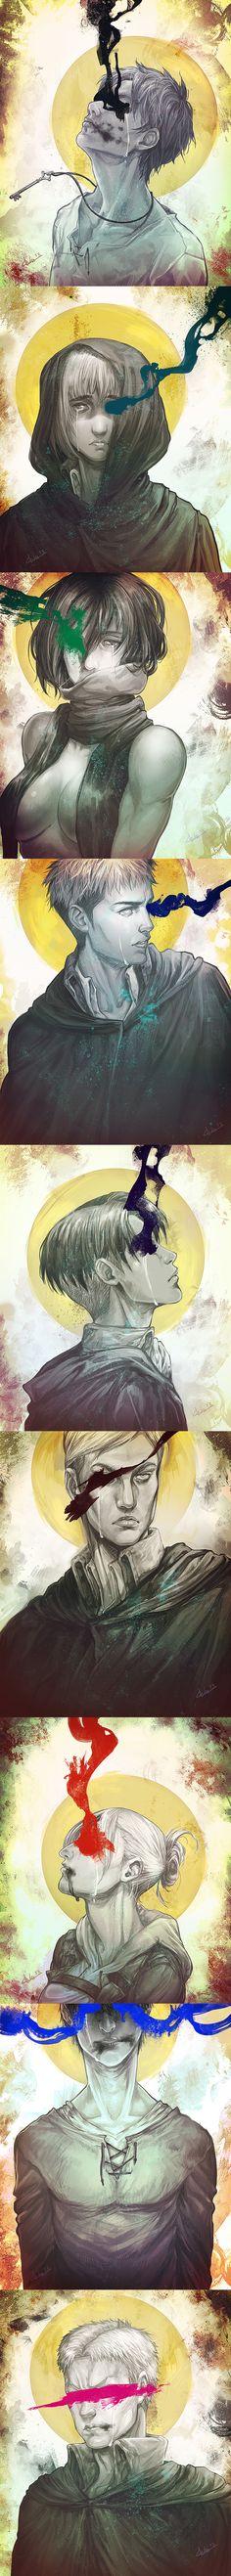 Shingeki No Kyojin/Attack on Titan fan art by idaiku17